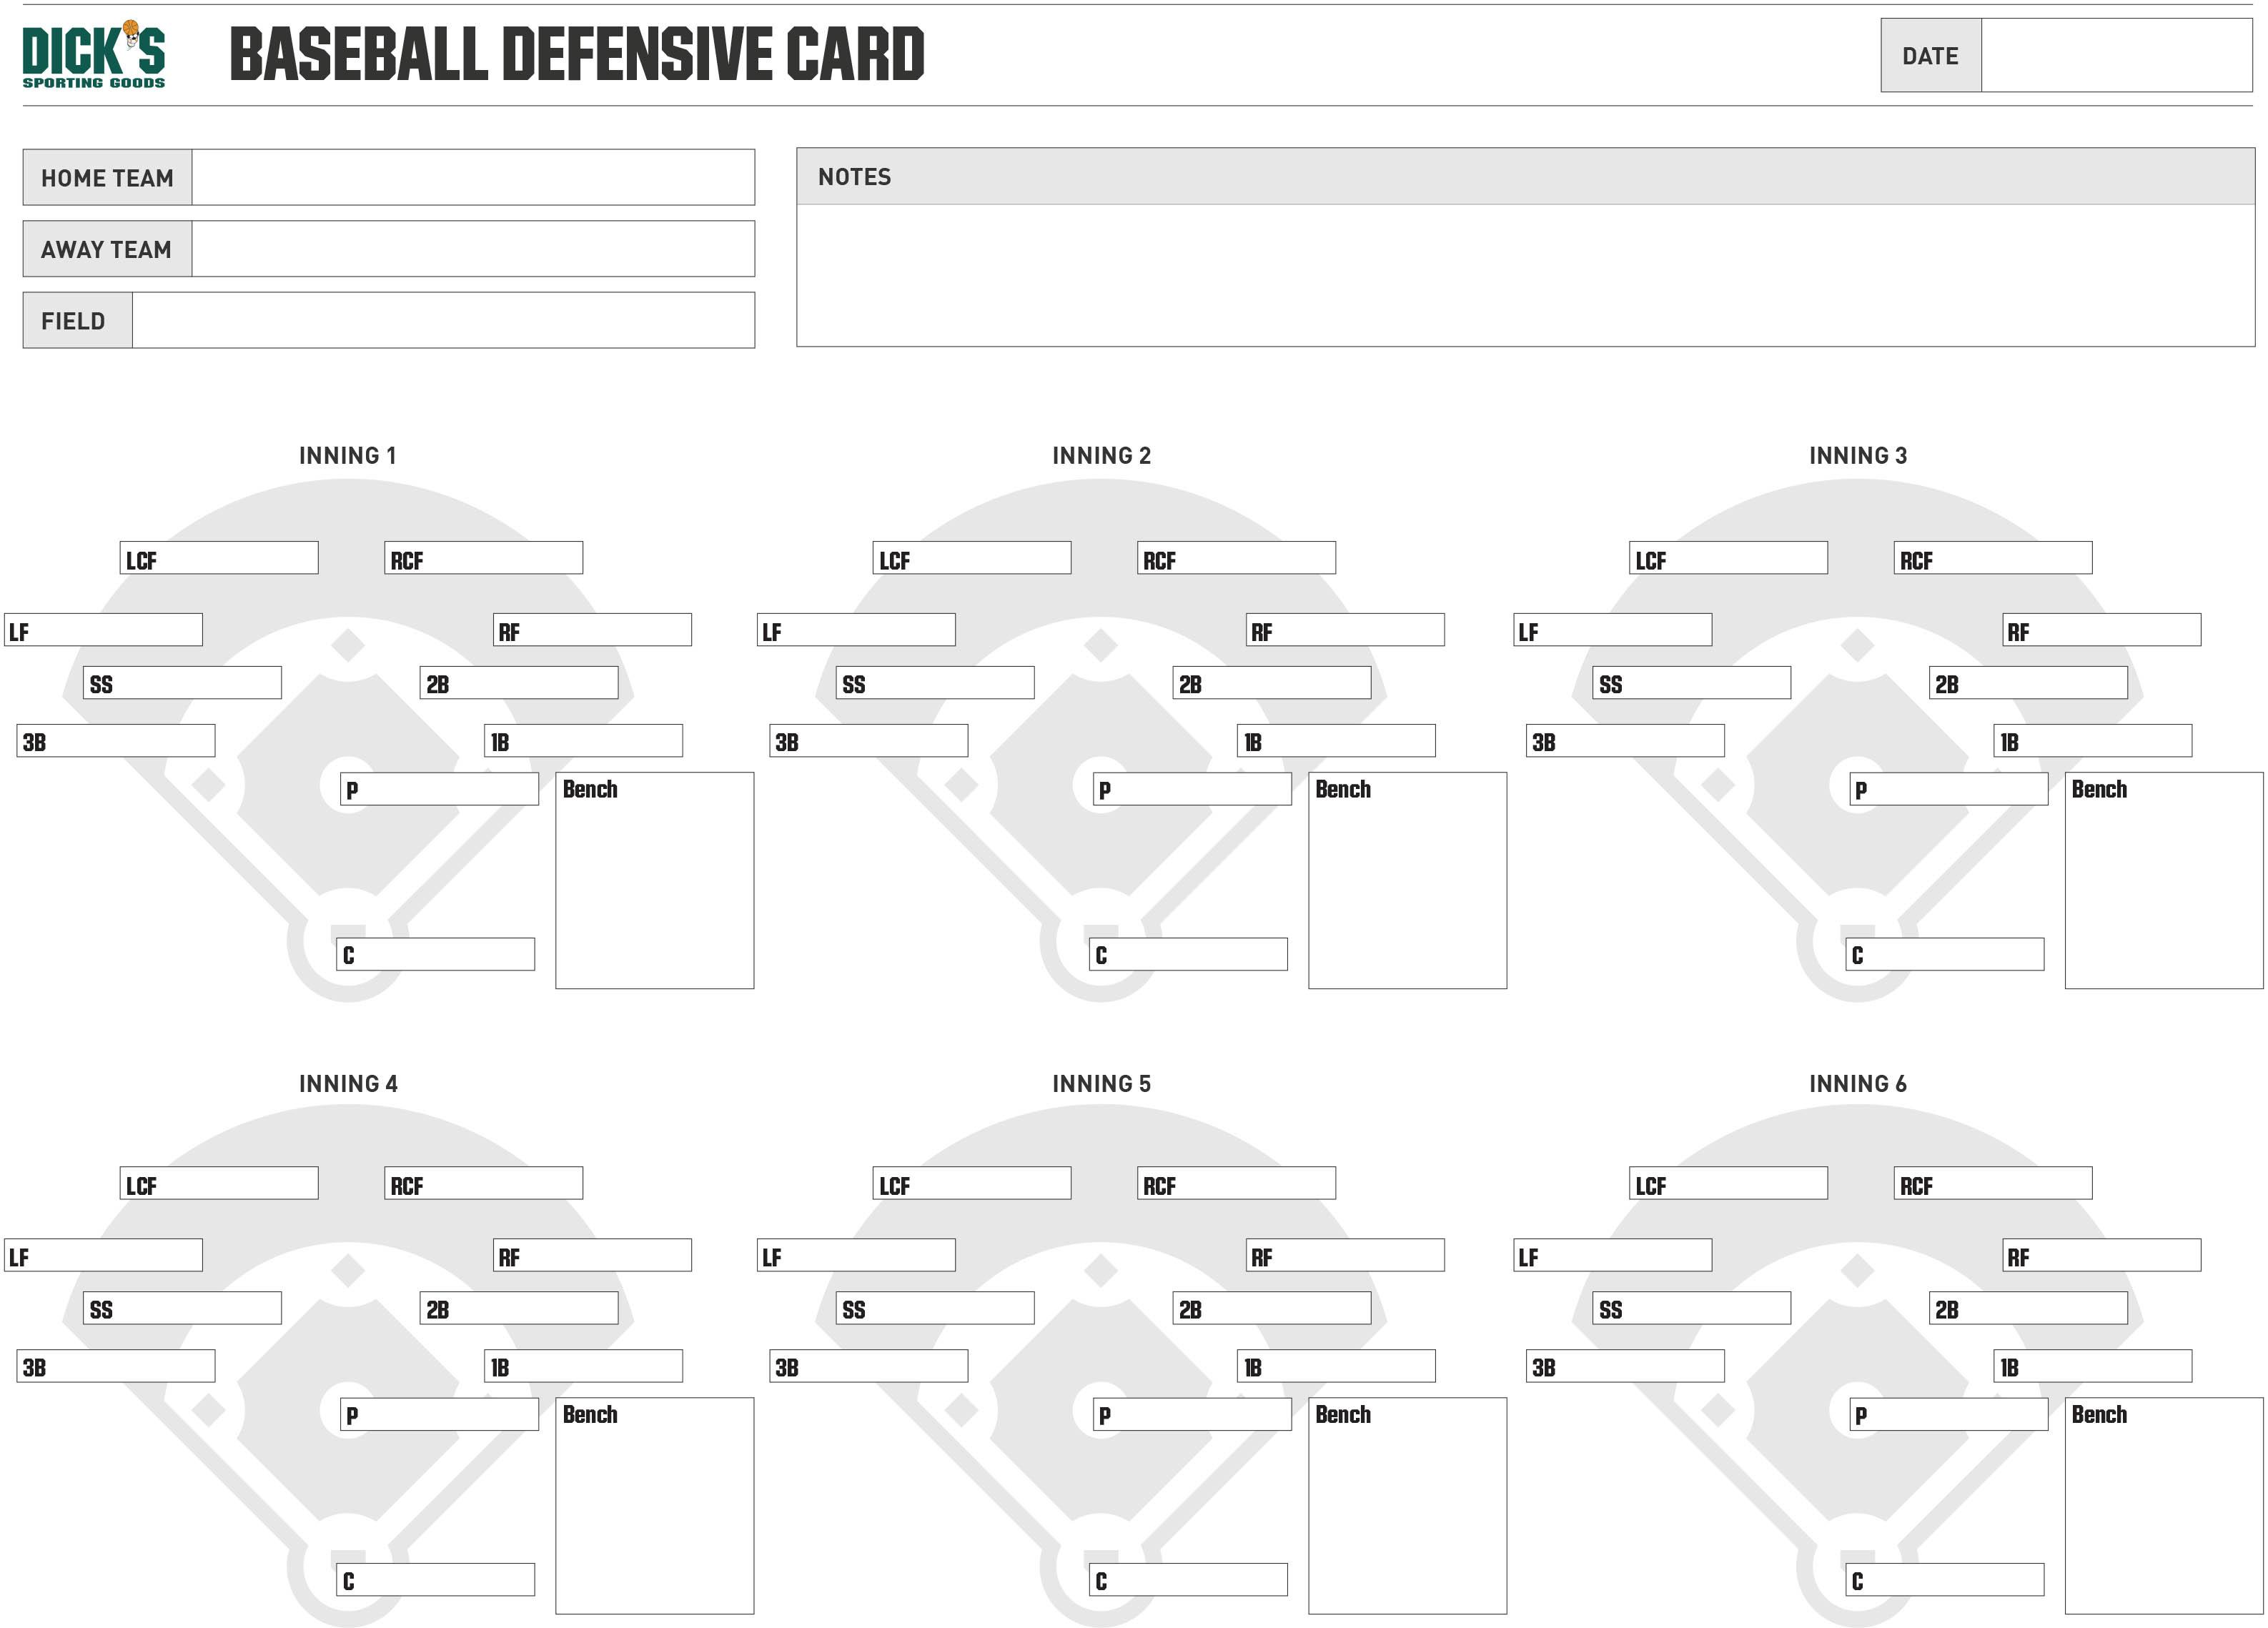 Baseball-defensive-lineup-card_pro-tips